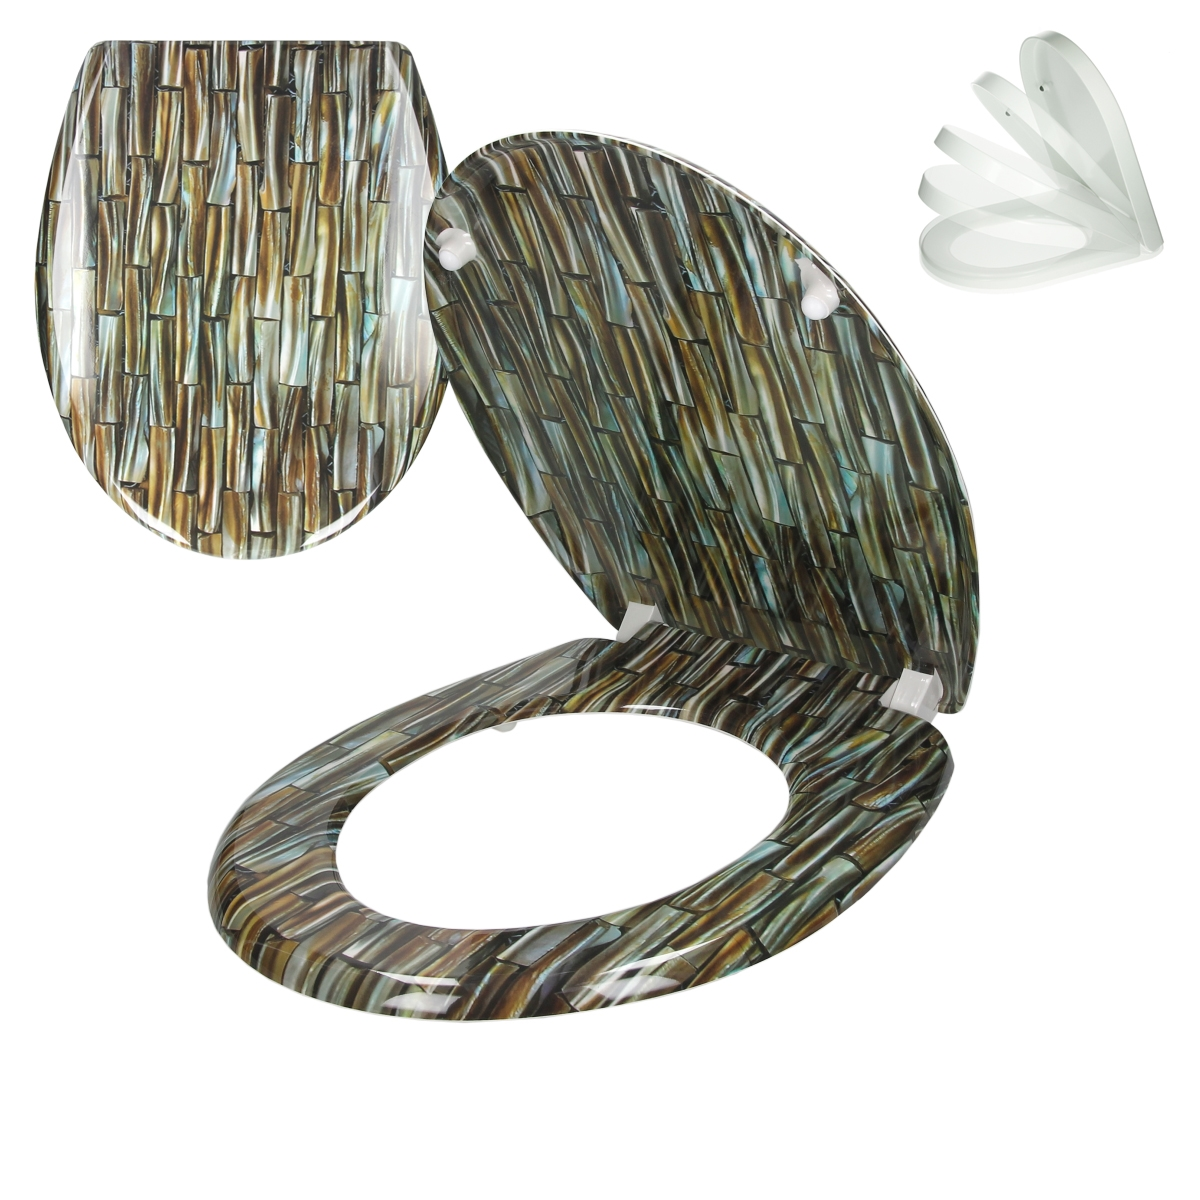 wc sitz toilettendeckel klodeckel deckel toilettensitz bad mit absenkautomatik ebay. Black Bedroom Furniture Sets. Home Design Ideas